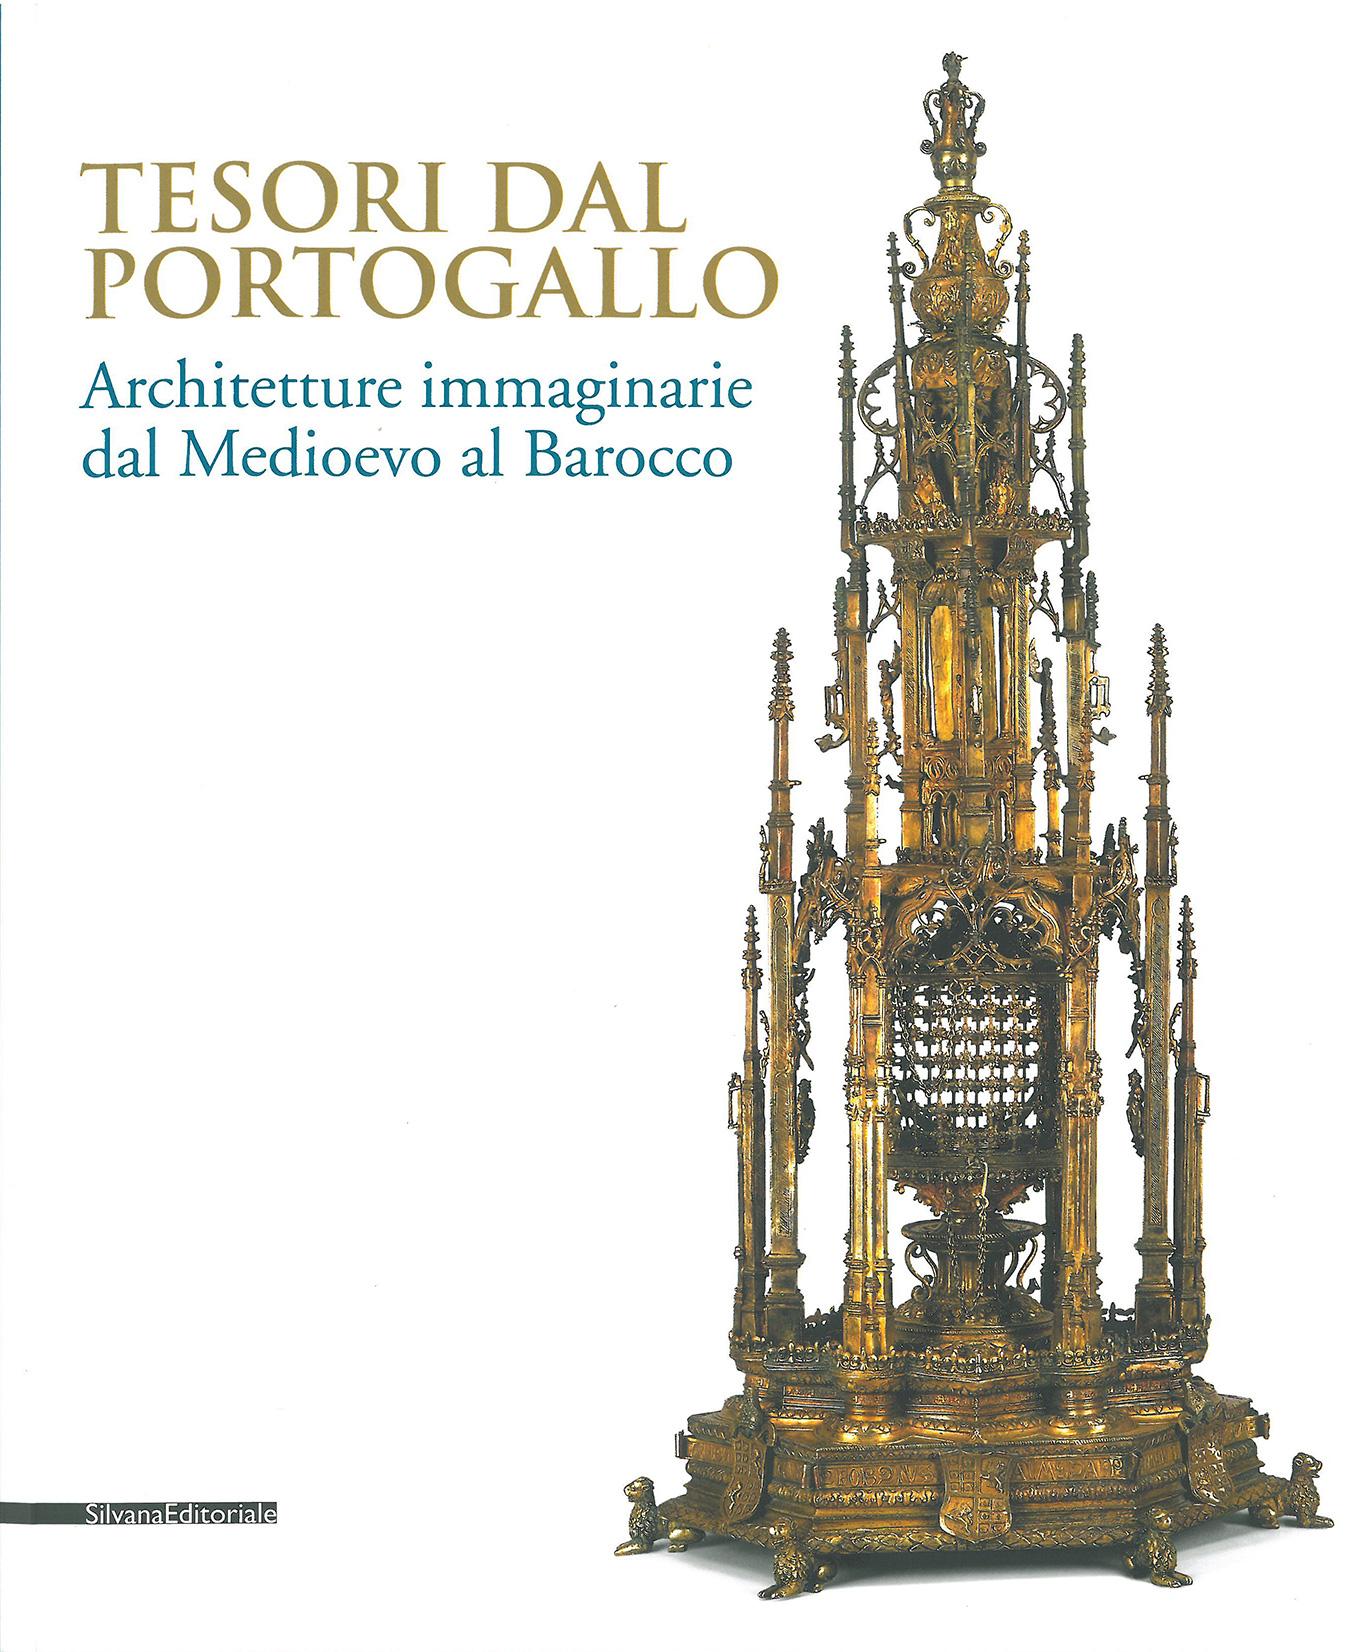 Catálogo exposição Turim Tesori dal Portogallo. Architetture imaginarei dal medievo al Barocco